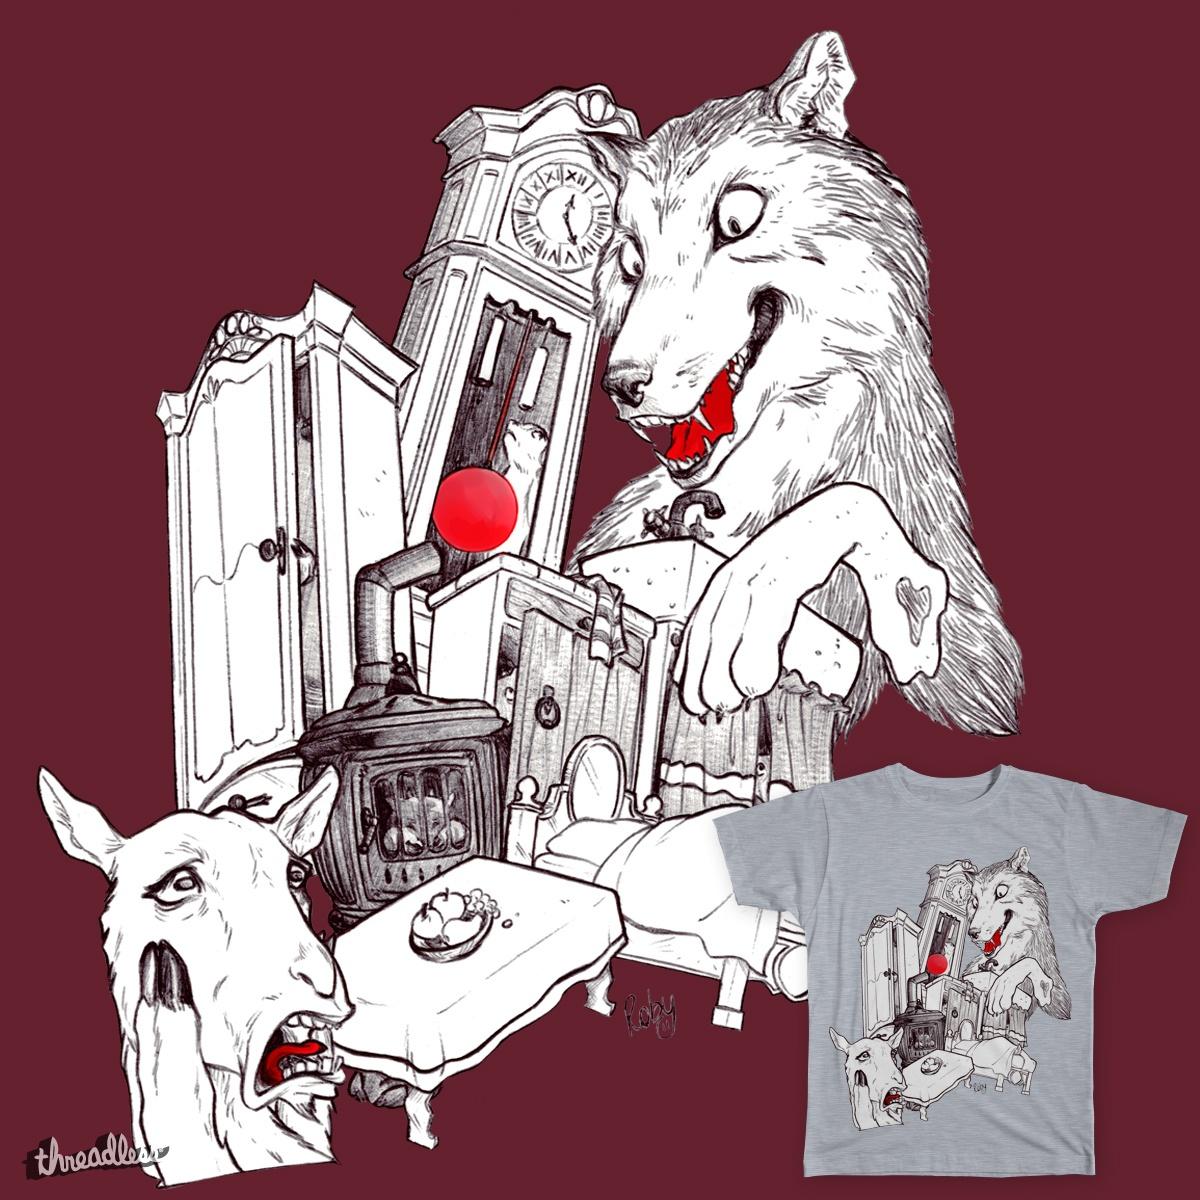 Wolf&7LittleGoats by robypierpi on Threadless